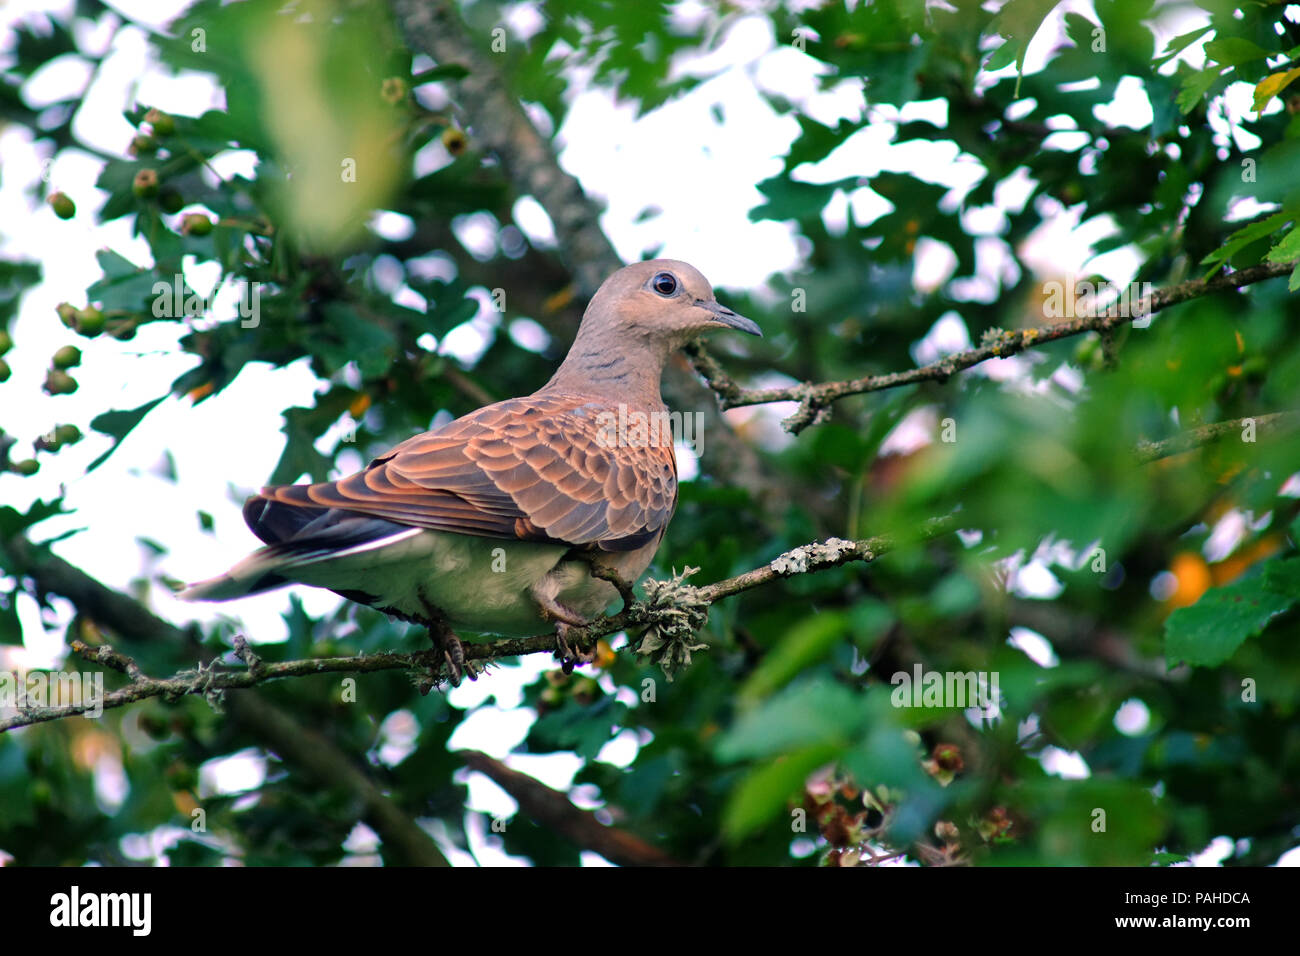 Turtle dove (Streptopelia turtur) perched in a tree. - Stock Image